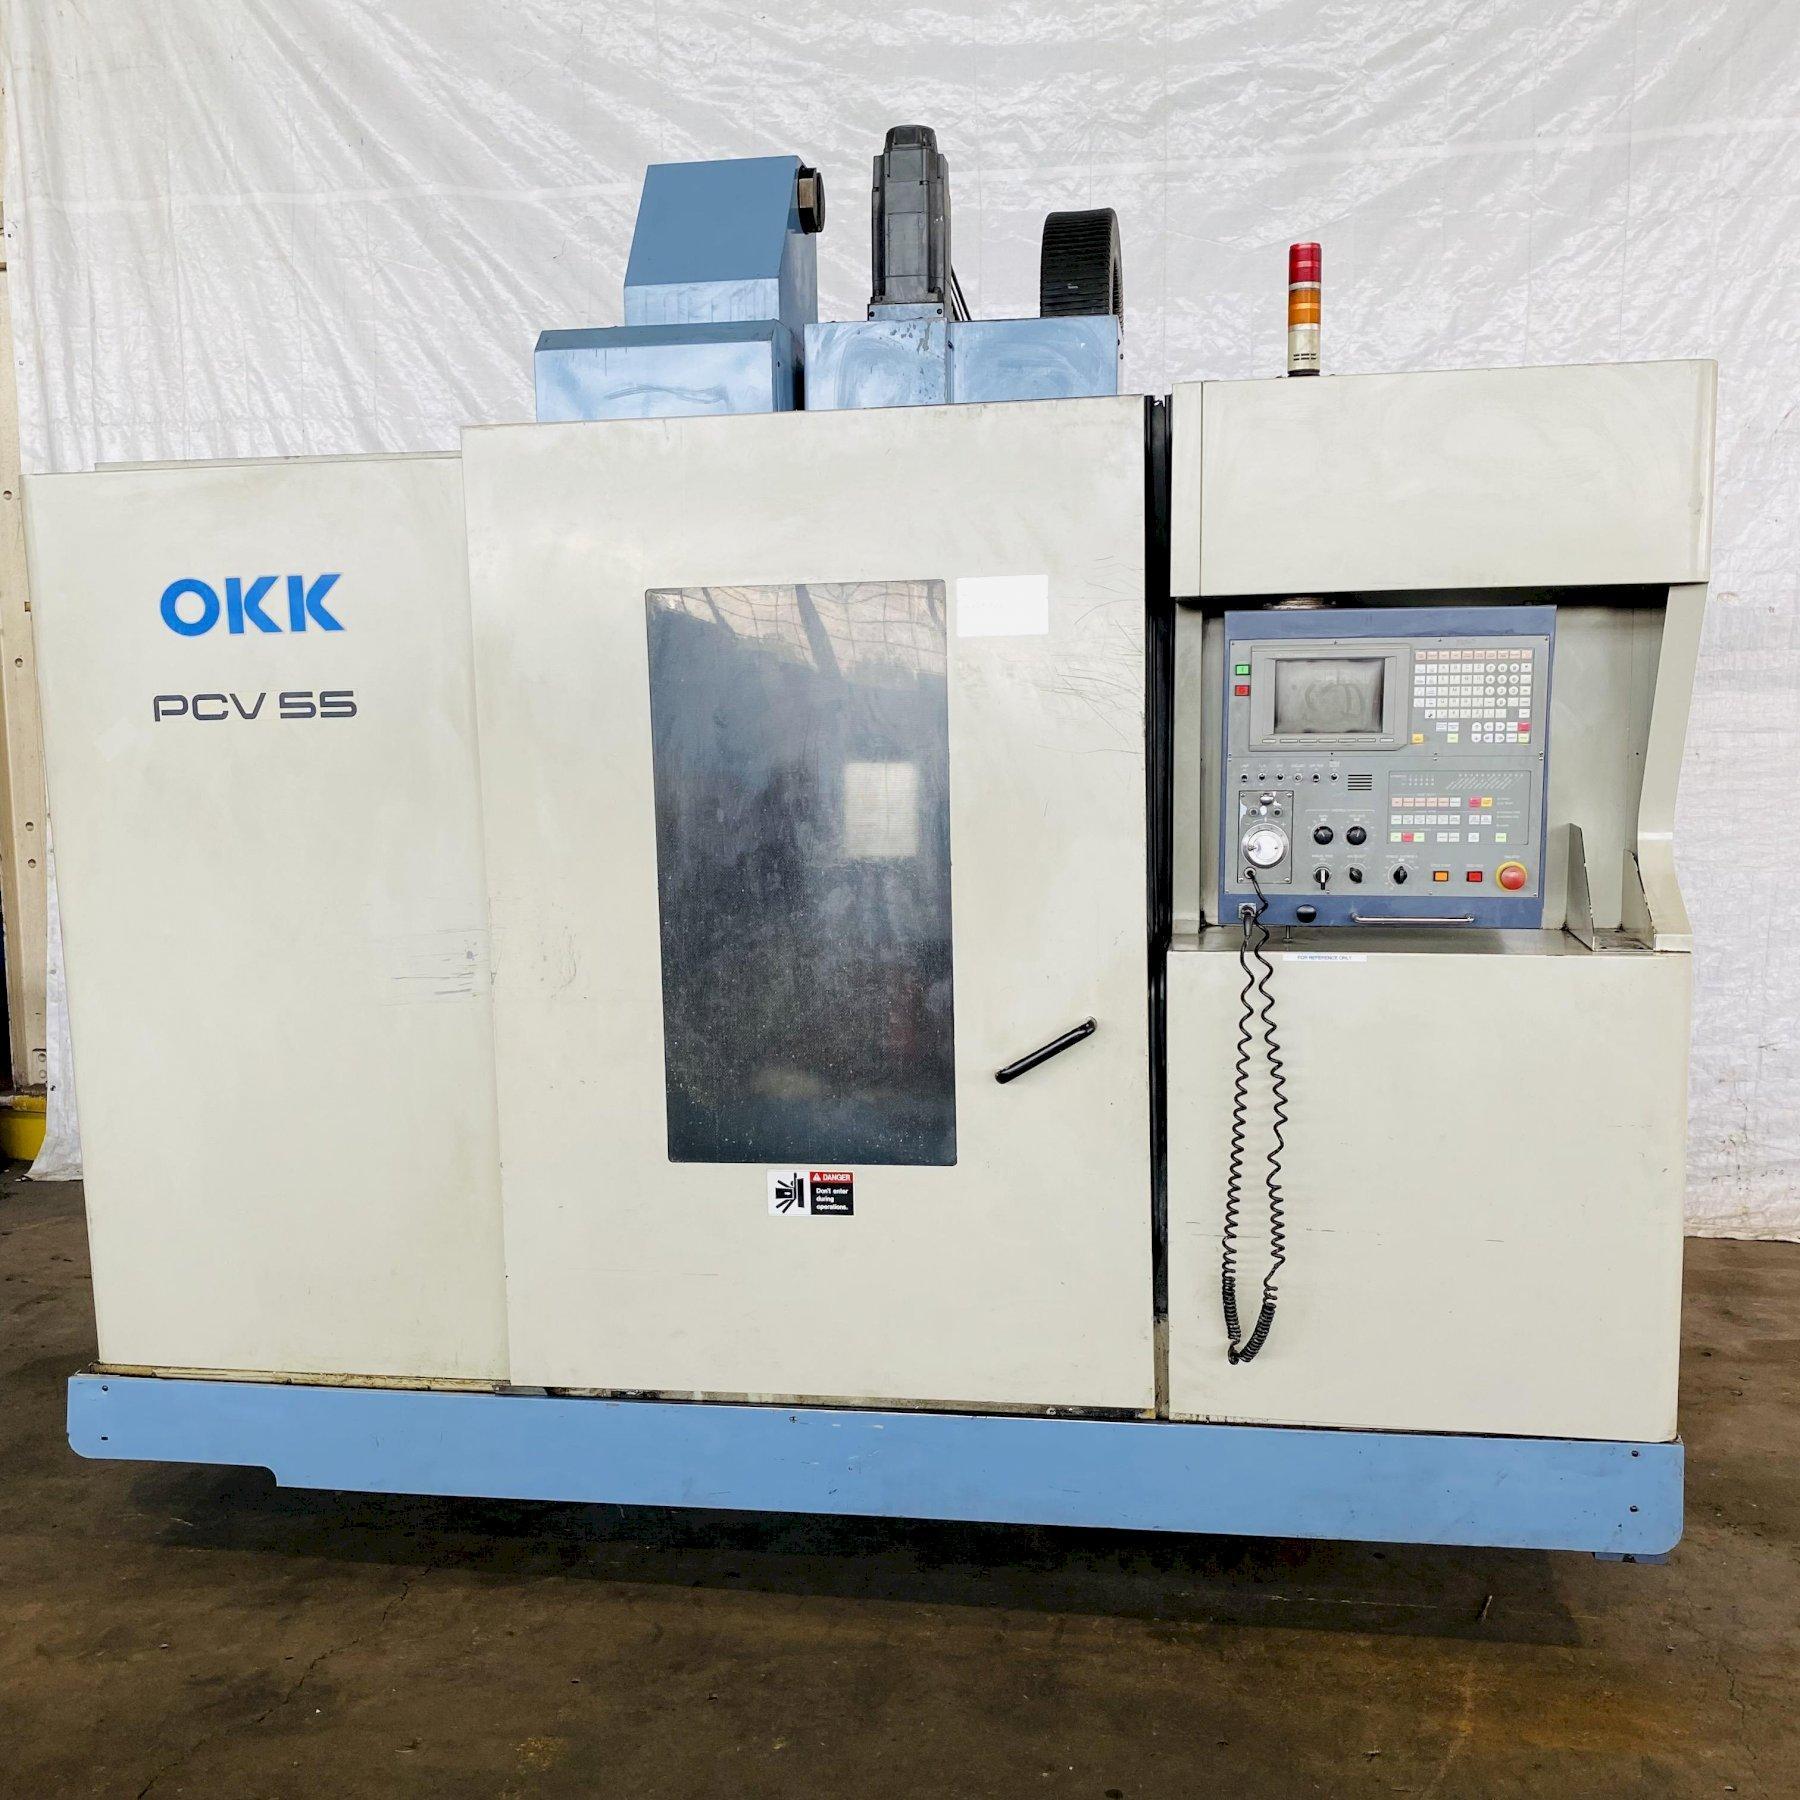 OKK PCV 55 CNC VERTICAL MACHINING CENTER. STOCK # 0633821